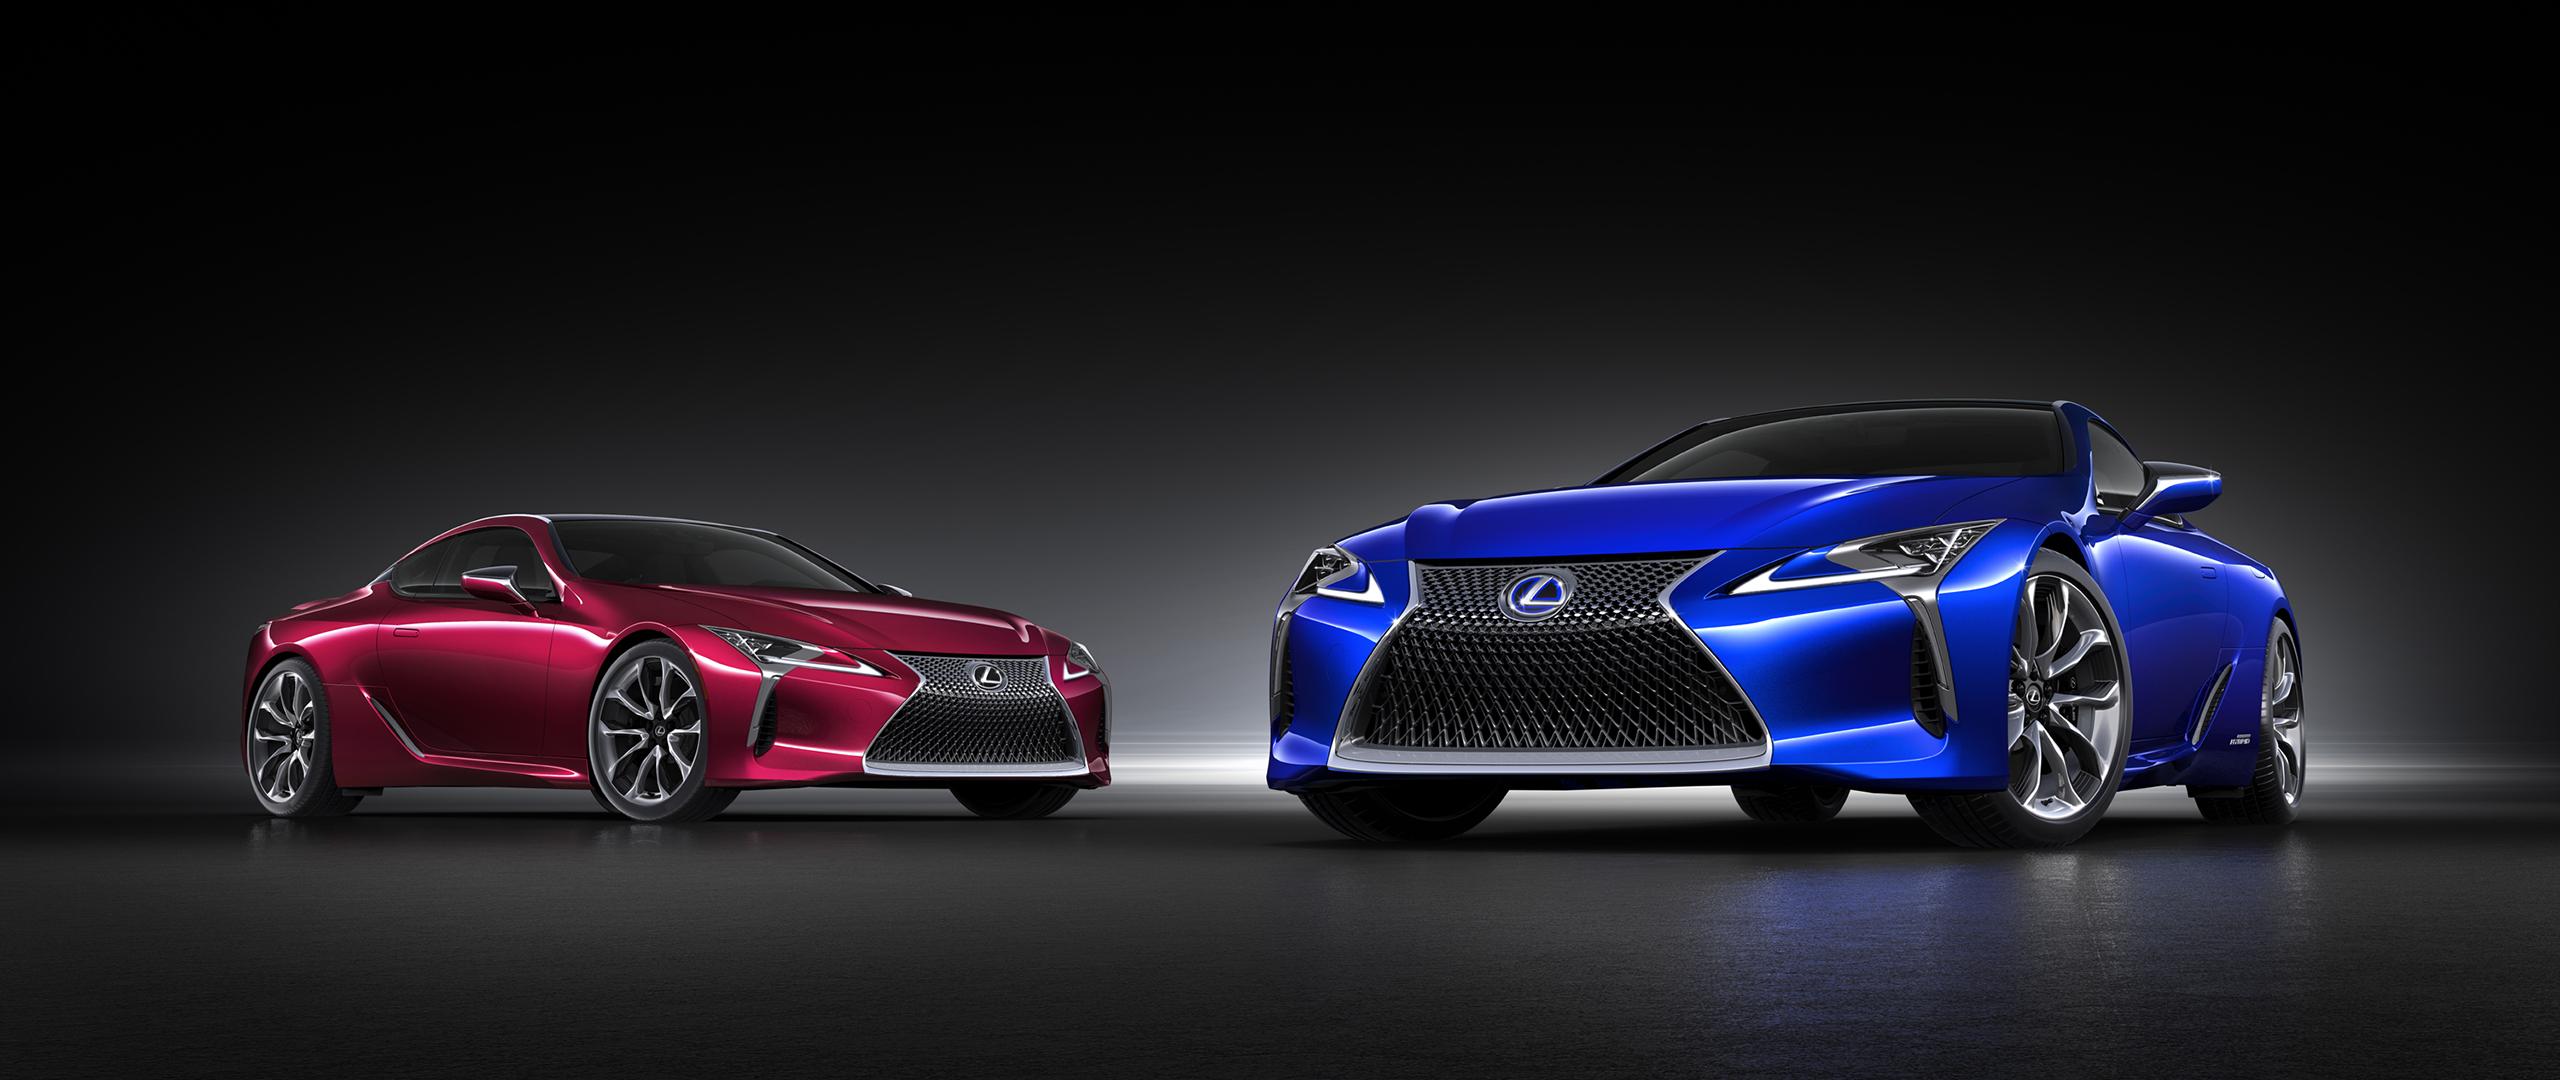 General 2560x1080 Lexus LC-500 car vehicle Hybrid electric car